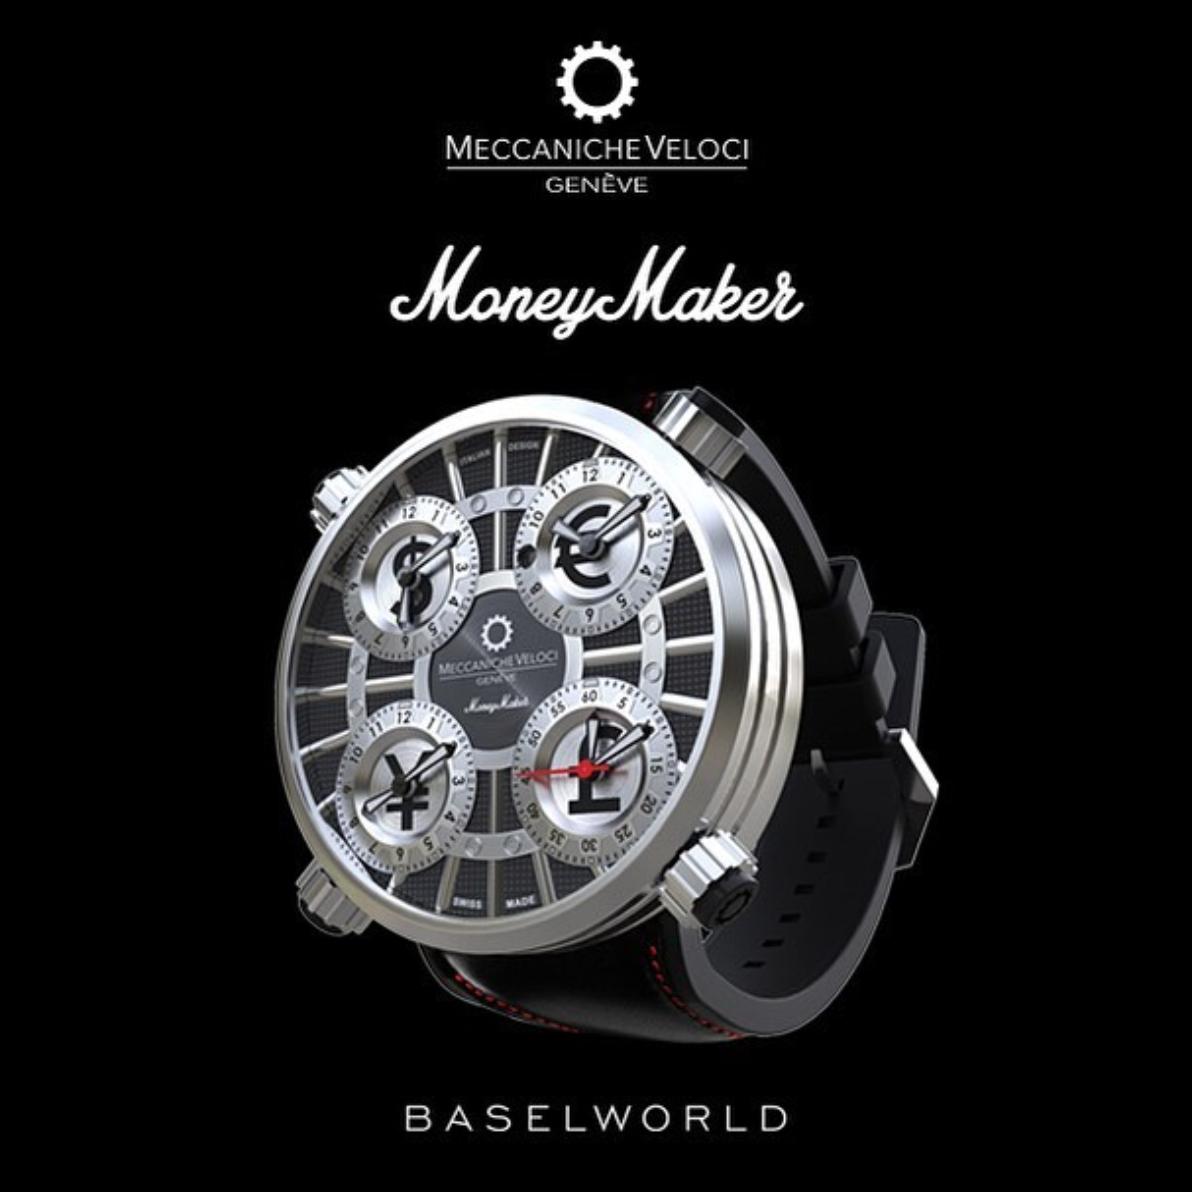 【MECCANICHE VELOCI メカニケ・ヴェローチ】MoneyMaker black マネーメーカー(ブラック) 世界限定250本/国内正規品 腕時計